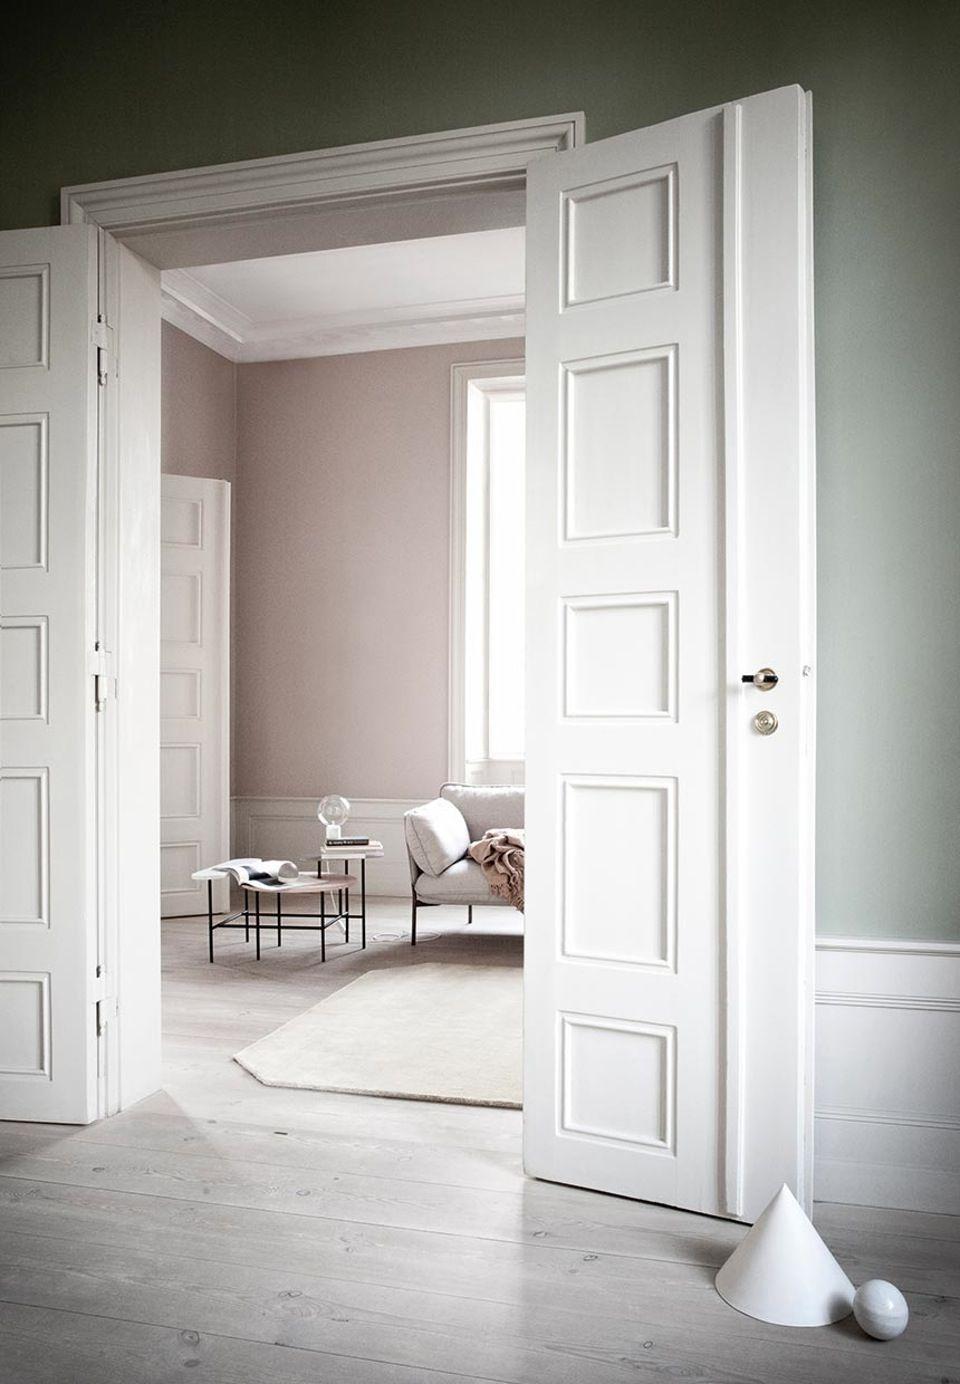 Home interior design color schemes pin by paige margaret on homeinterior design  pinterest